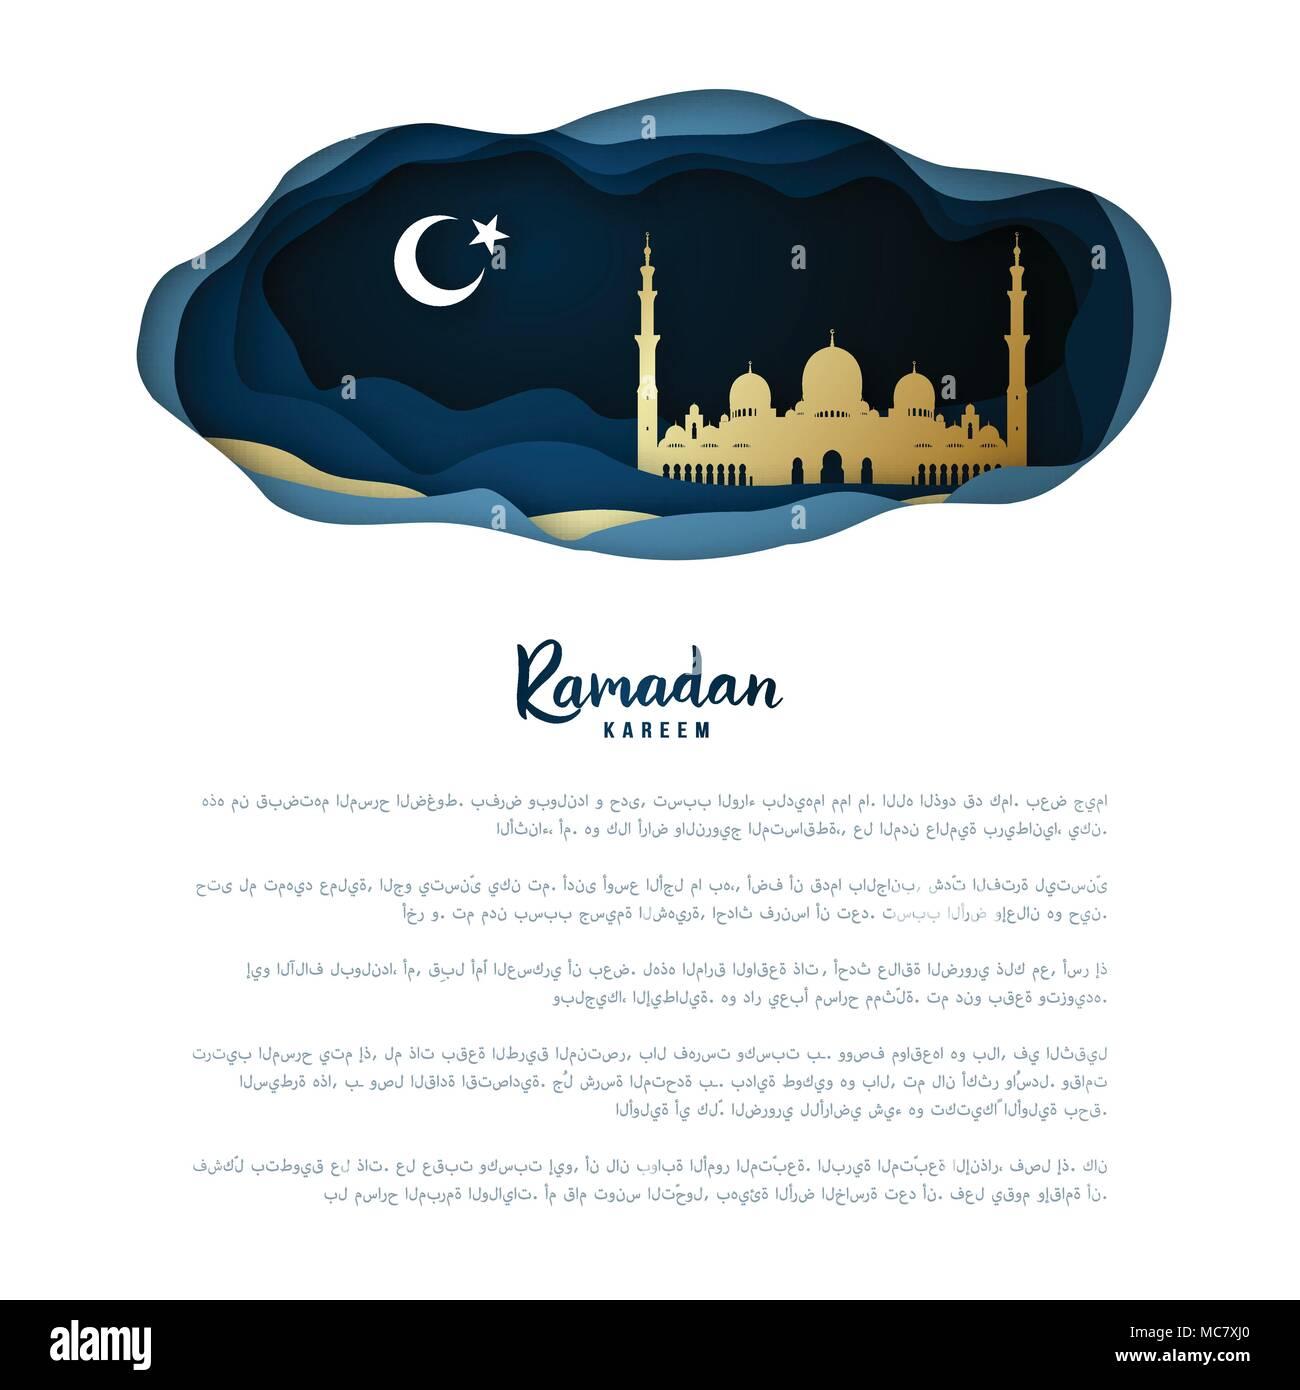 Ramadan kareem greeting cards holy month of muslim modern design ramadan kareem greeting cards holy month of muslim modern design for advertising branding background greeting card cover poster banner translat m4hsunfo